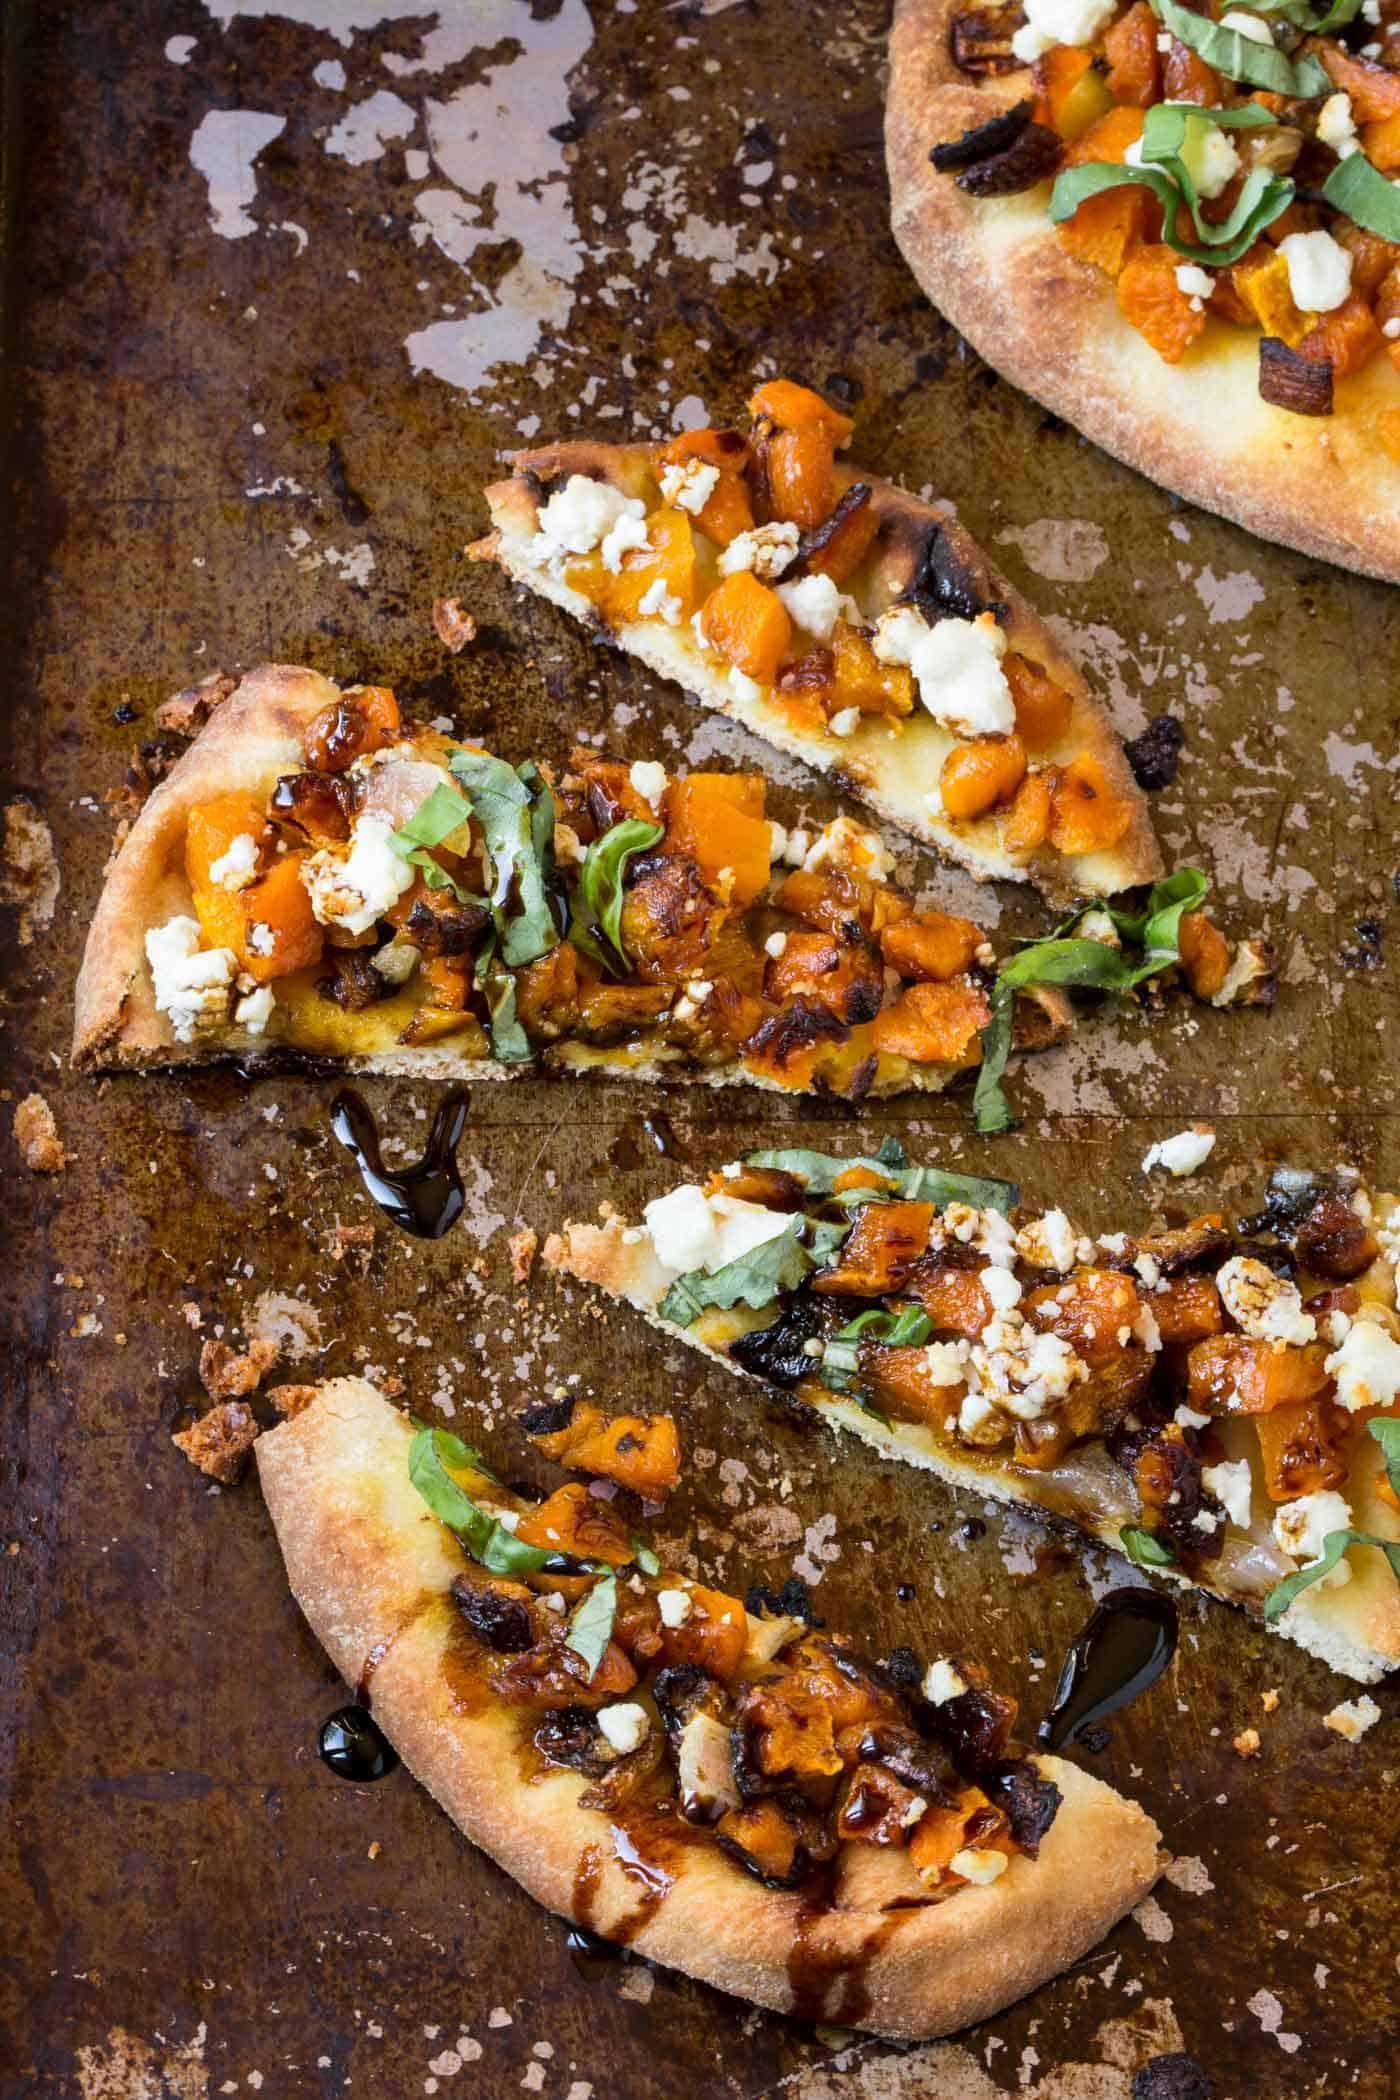 Roasted Butternut Squash Naan Pizza – Garnish with Lemon